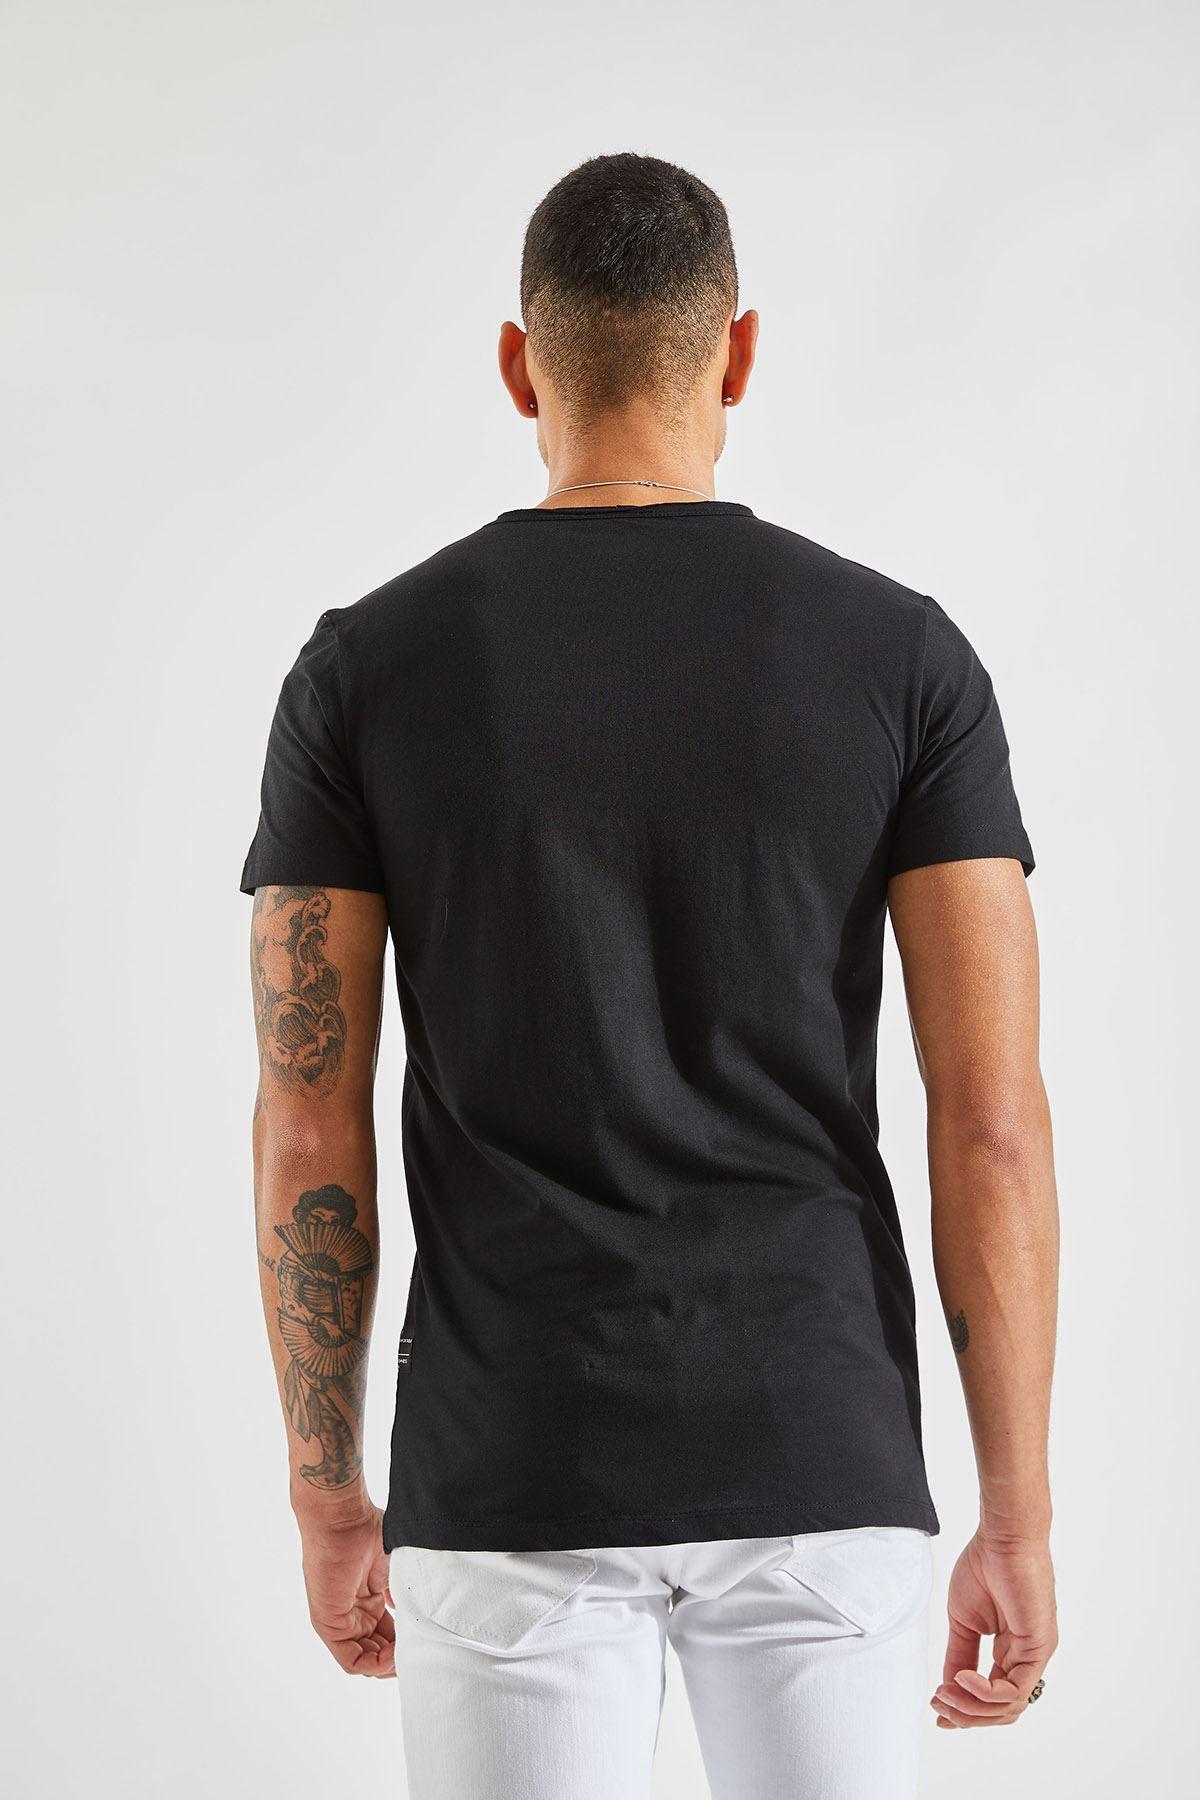 Bisiklet Yaka Cepli Siyah Erkek T-Shirt